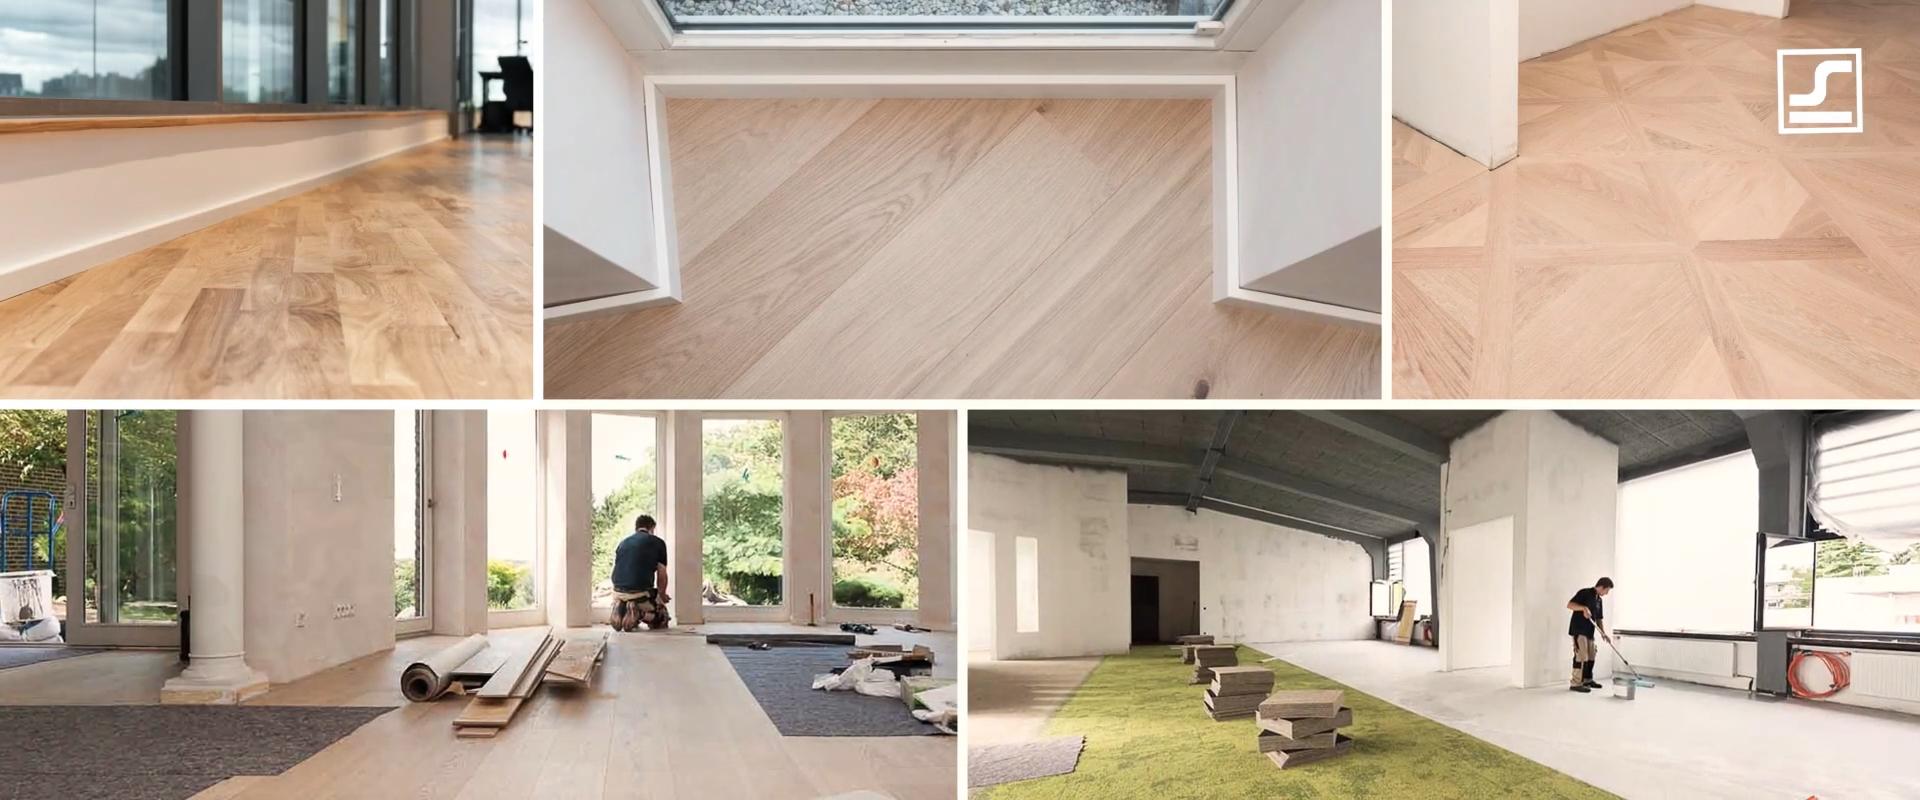 corporate film Schneppensiefen – Floors forever